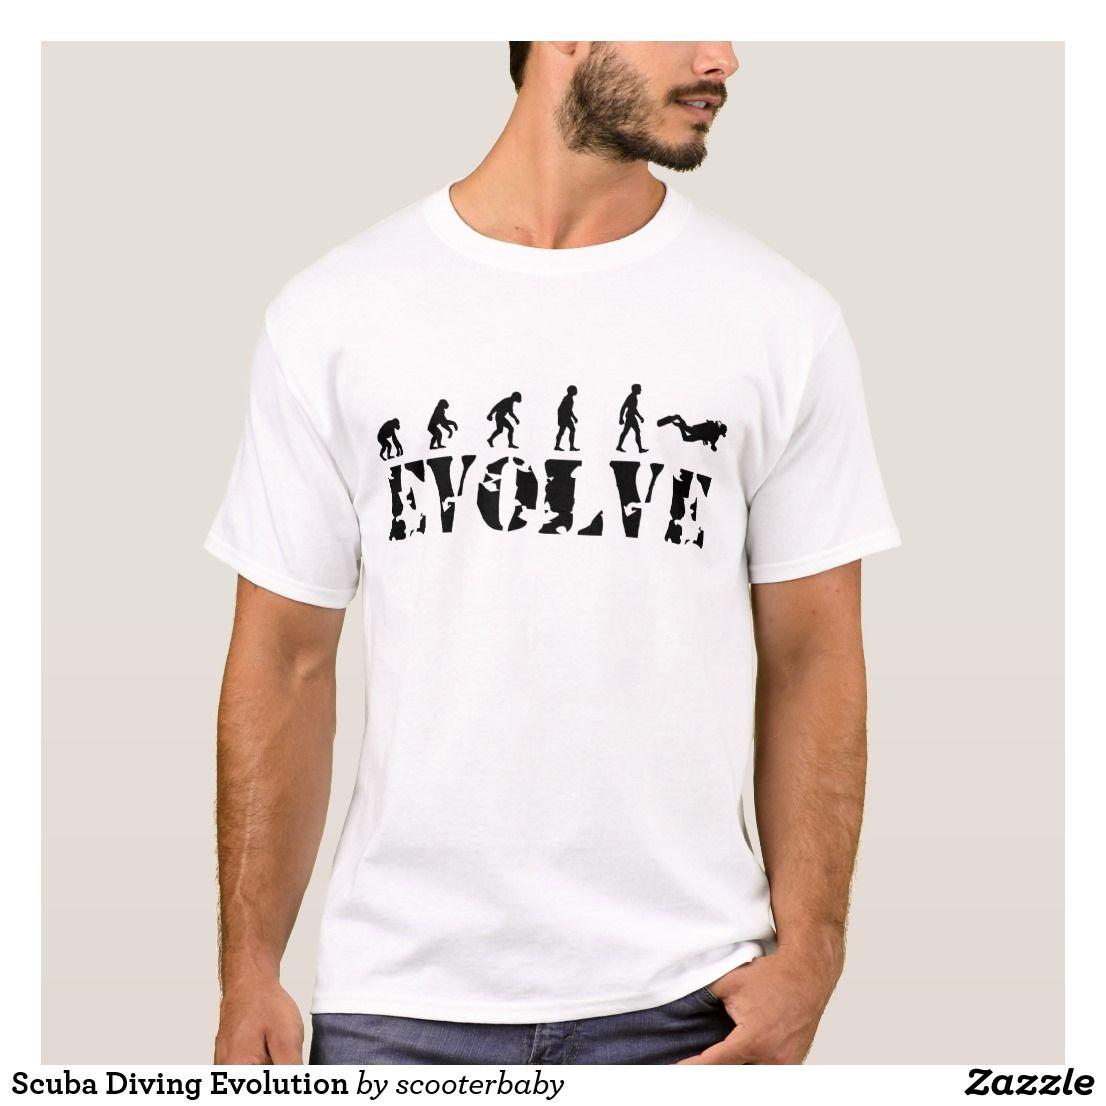 fc08c576e Scuba Diving Evolution T-Shirt   Zazzle.com   Sports T-Shirts and ...